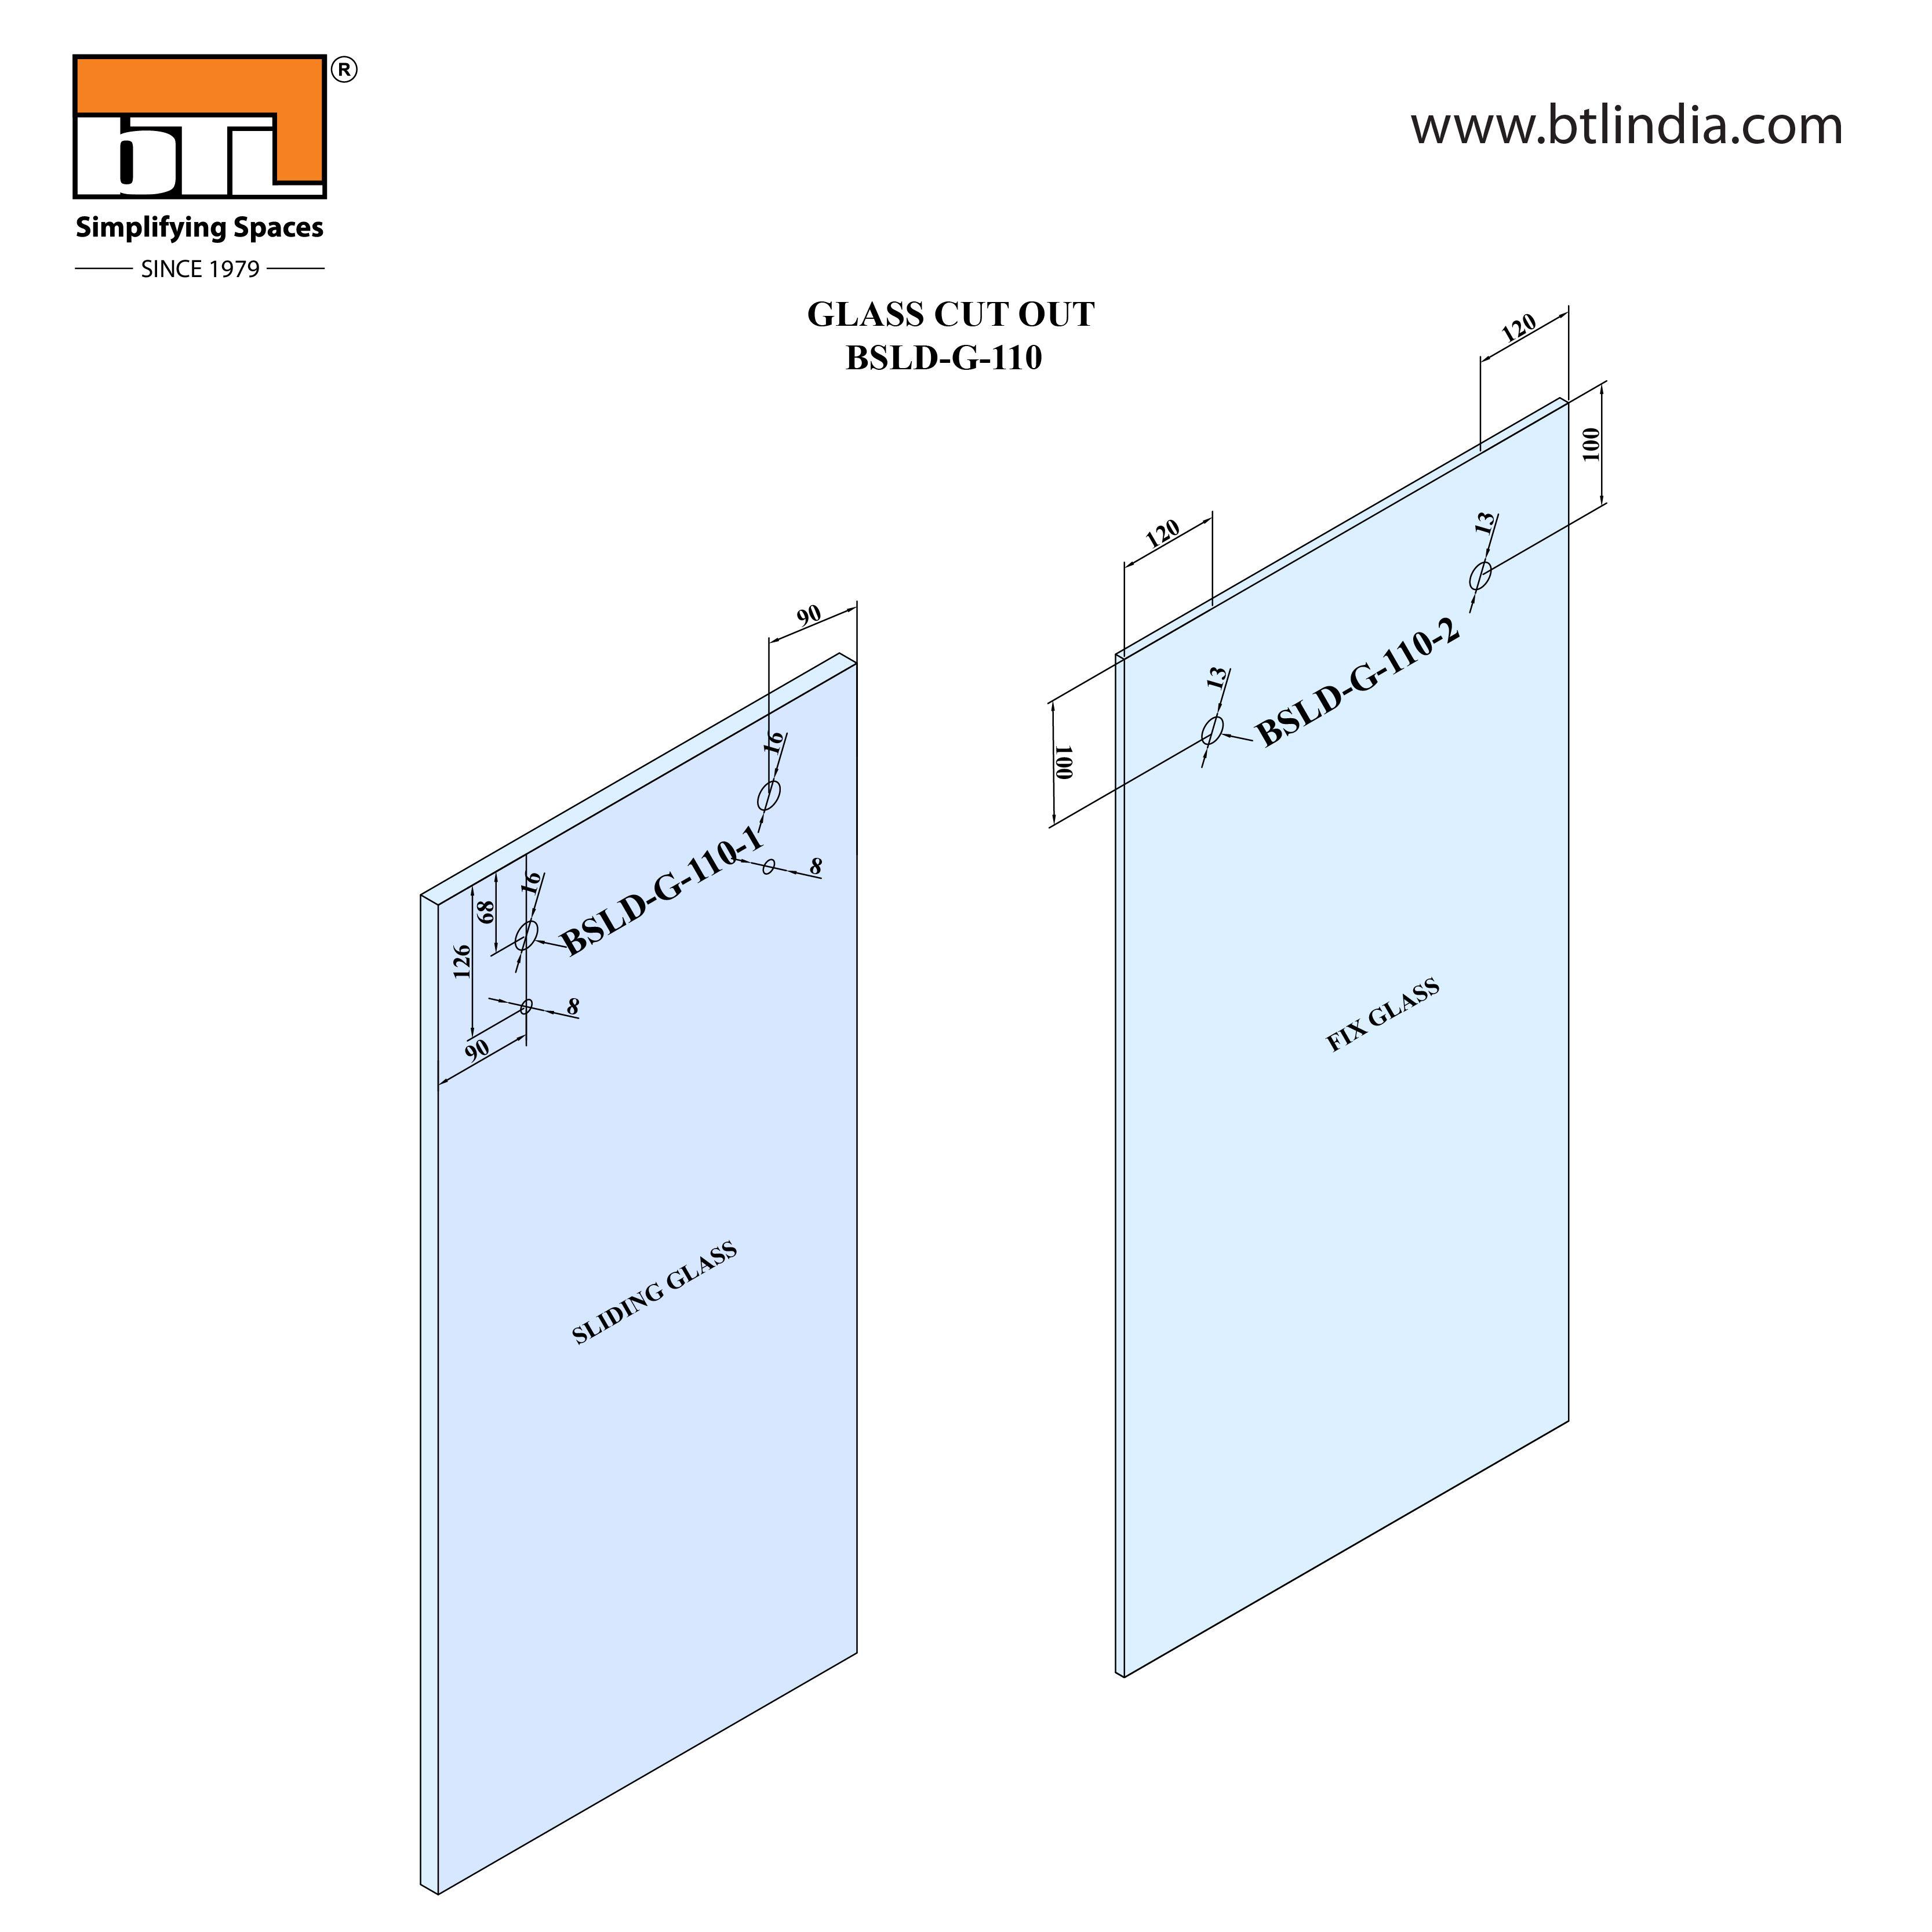 BTL Glass Door Sliding Set - G110 - Installation Instruction with Glass Door Cut out